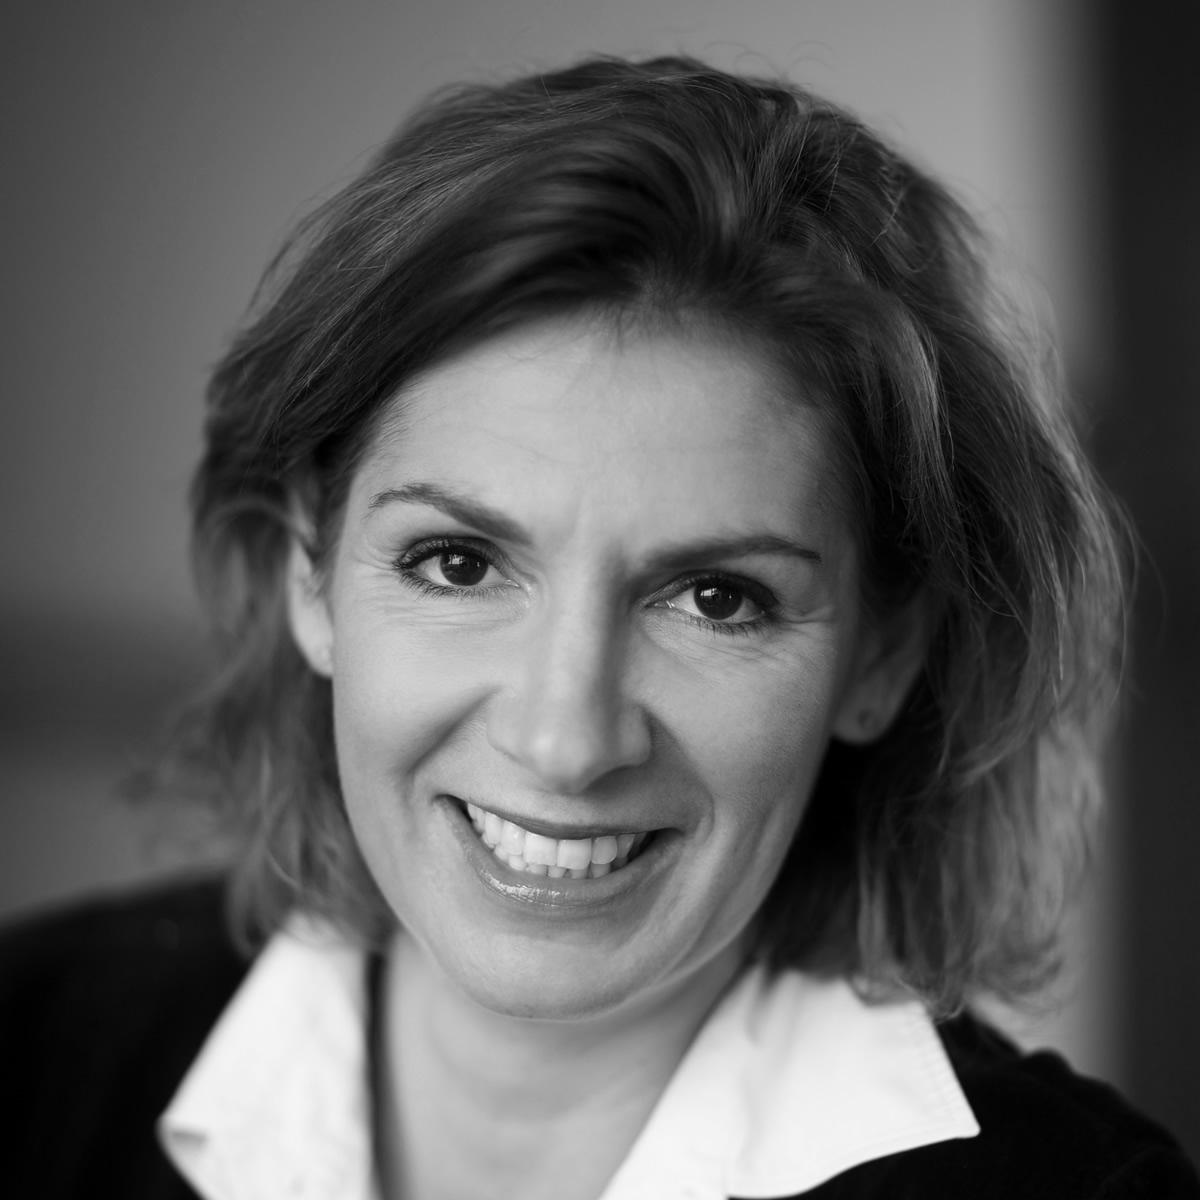 Helle Bank Jørgensen, CEO; B.Accountability